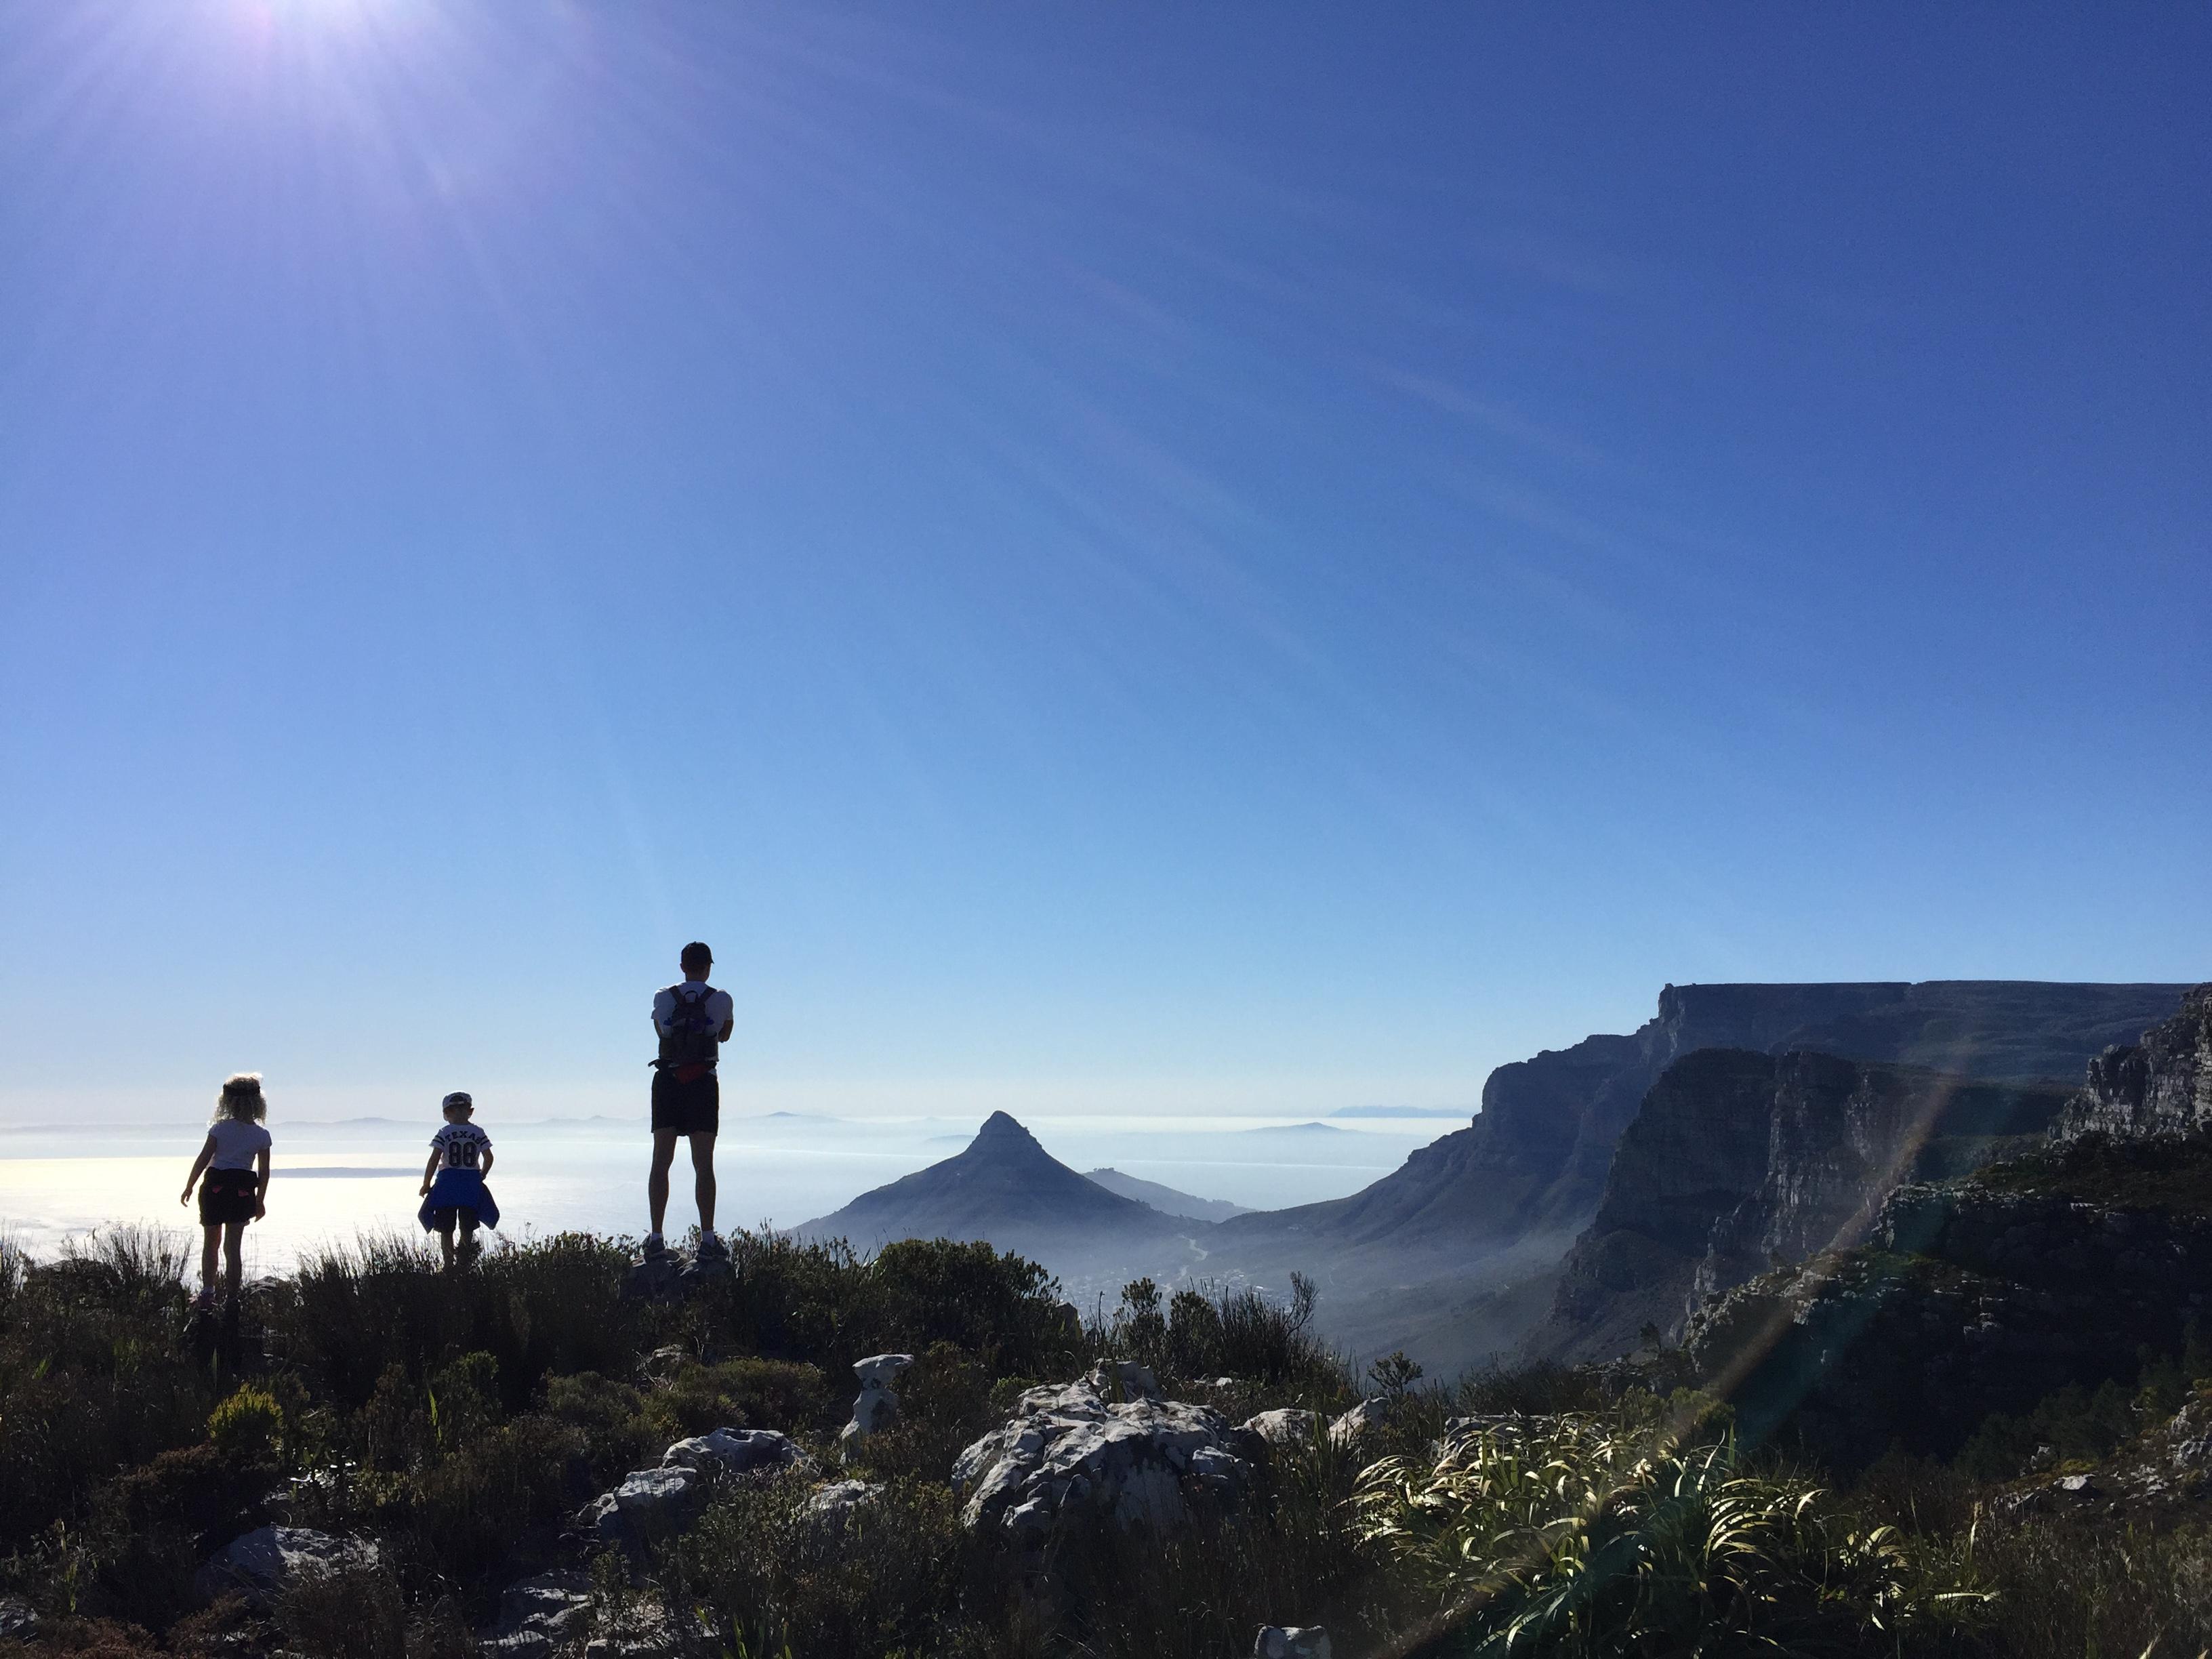 Summiting the Elusive Path